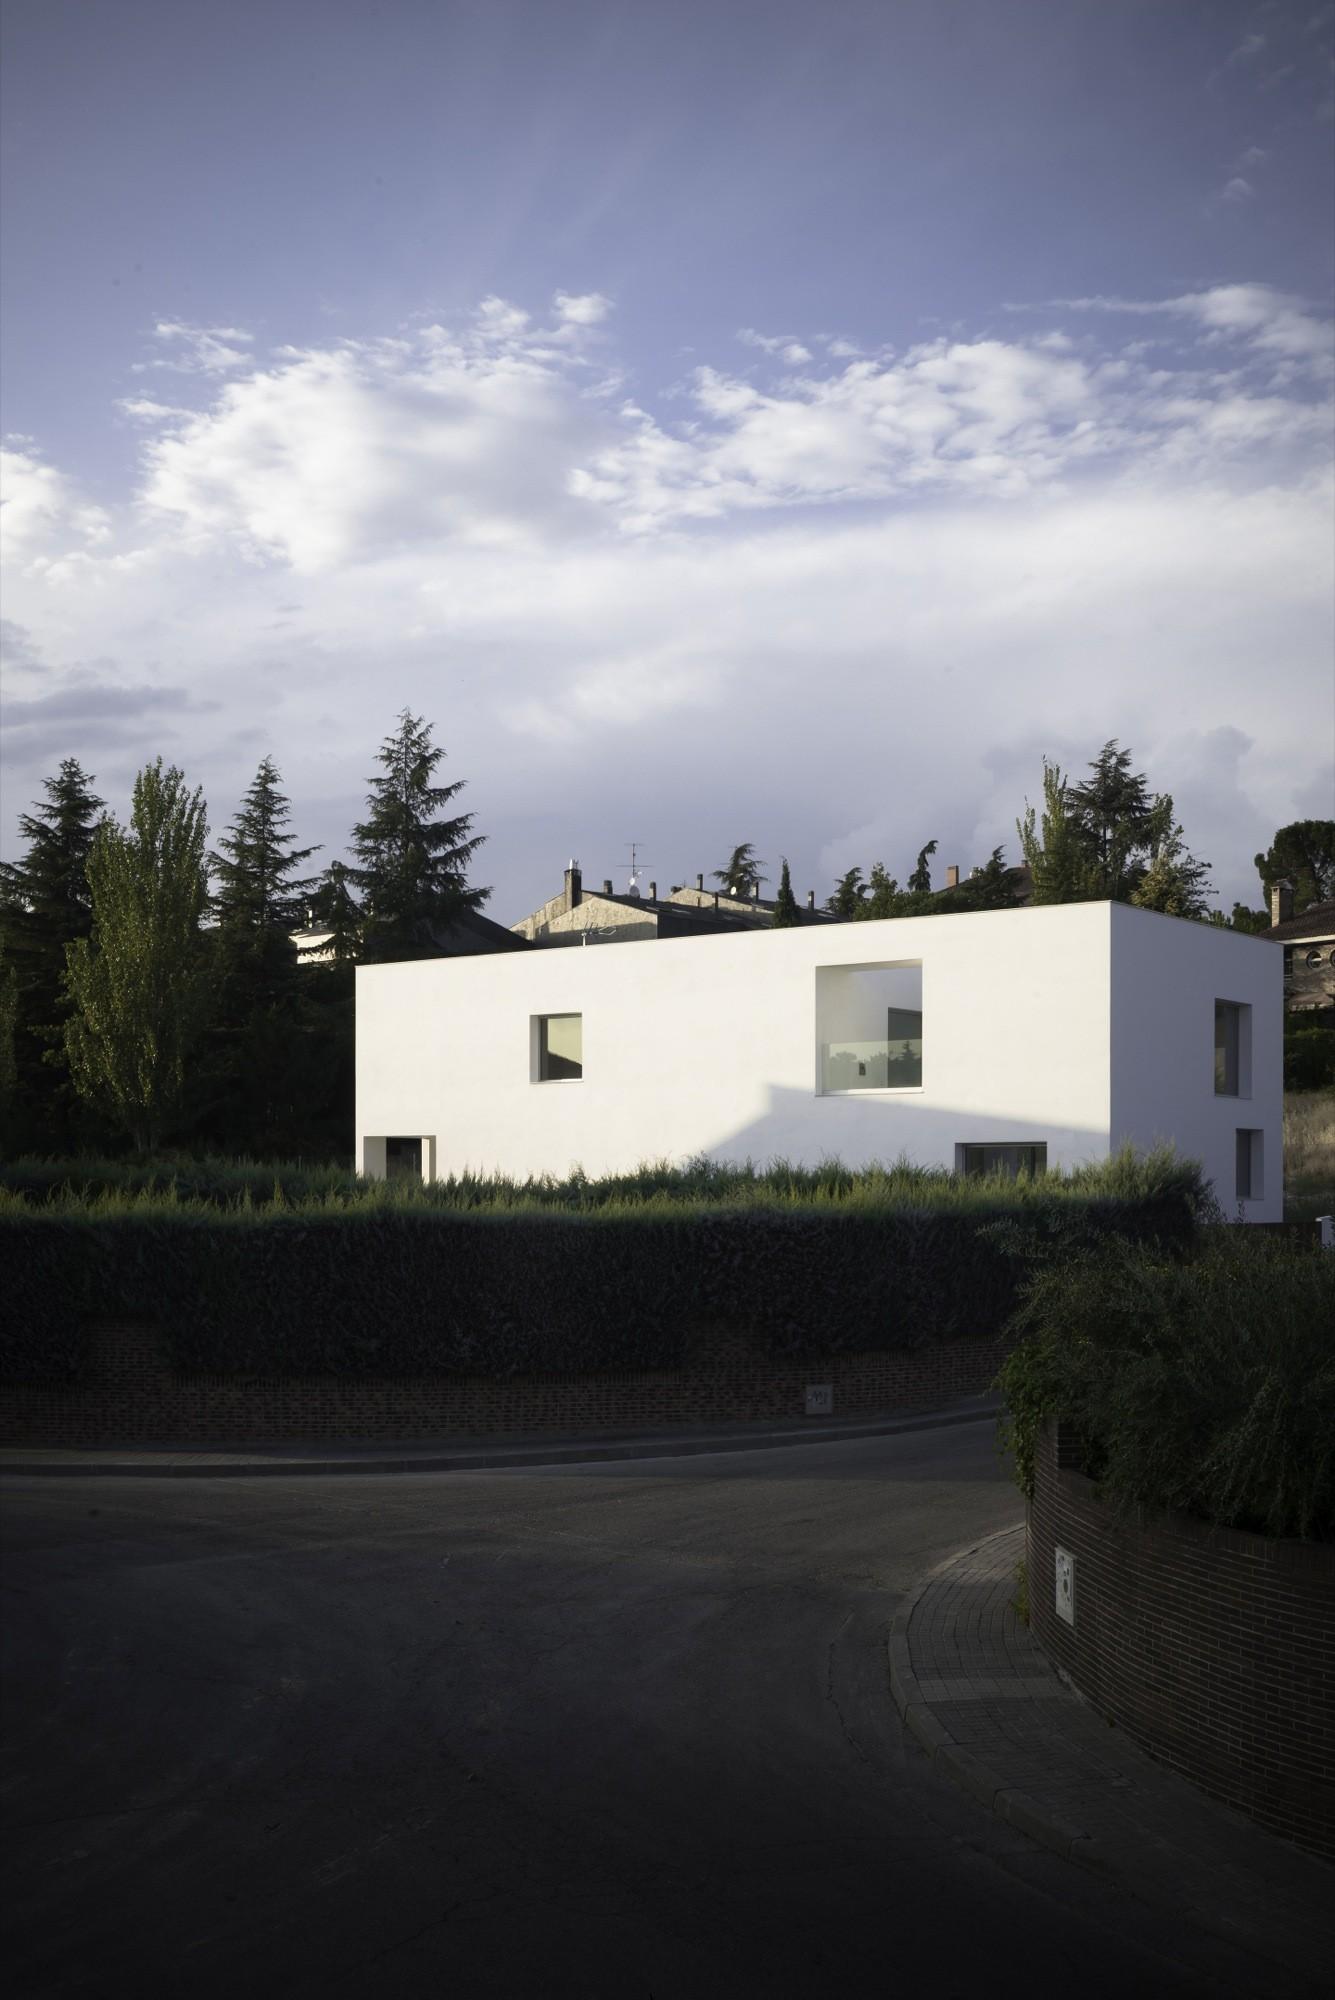 Galeria de casa h bojaus arquitectura 12 for Casa de los azulejos arquitectura